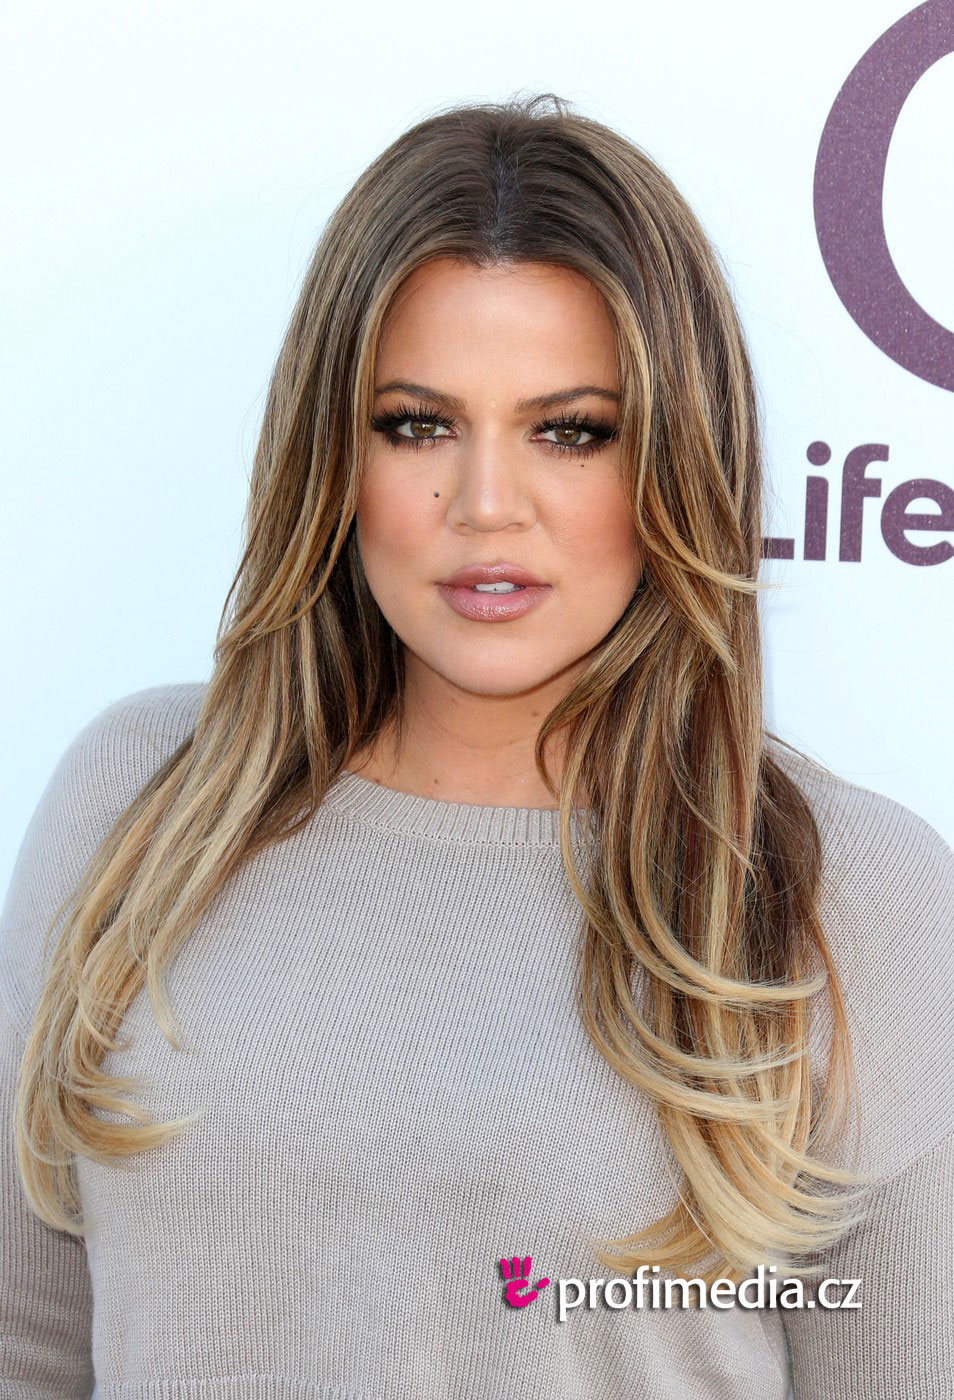 Khloe Kardashian Hairstyle Easyhairstyler